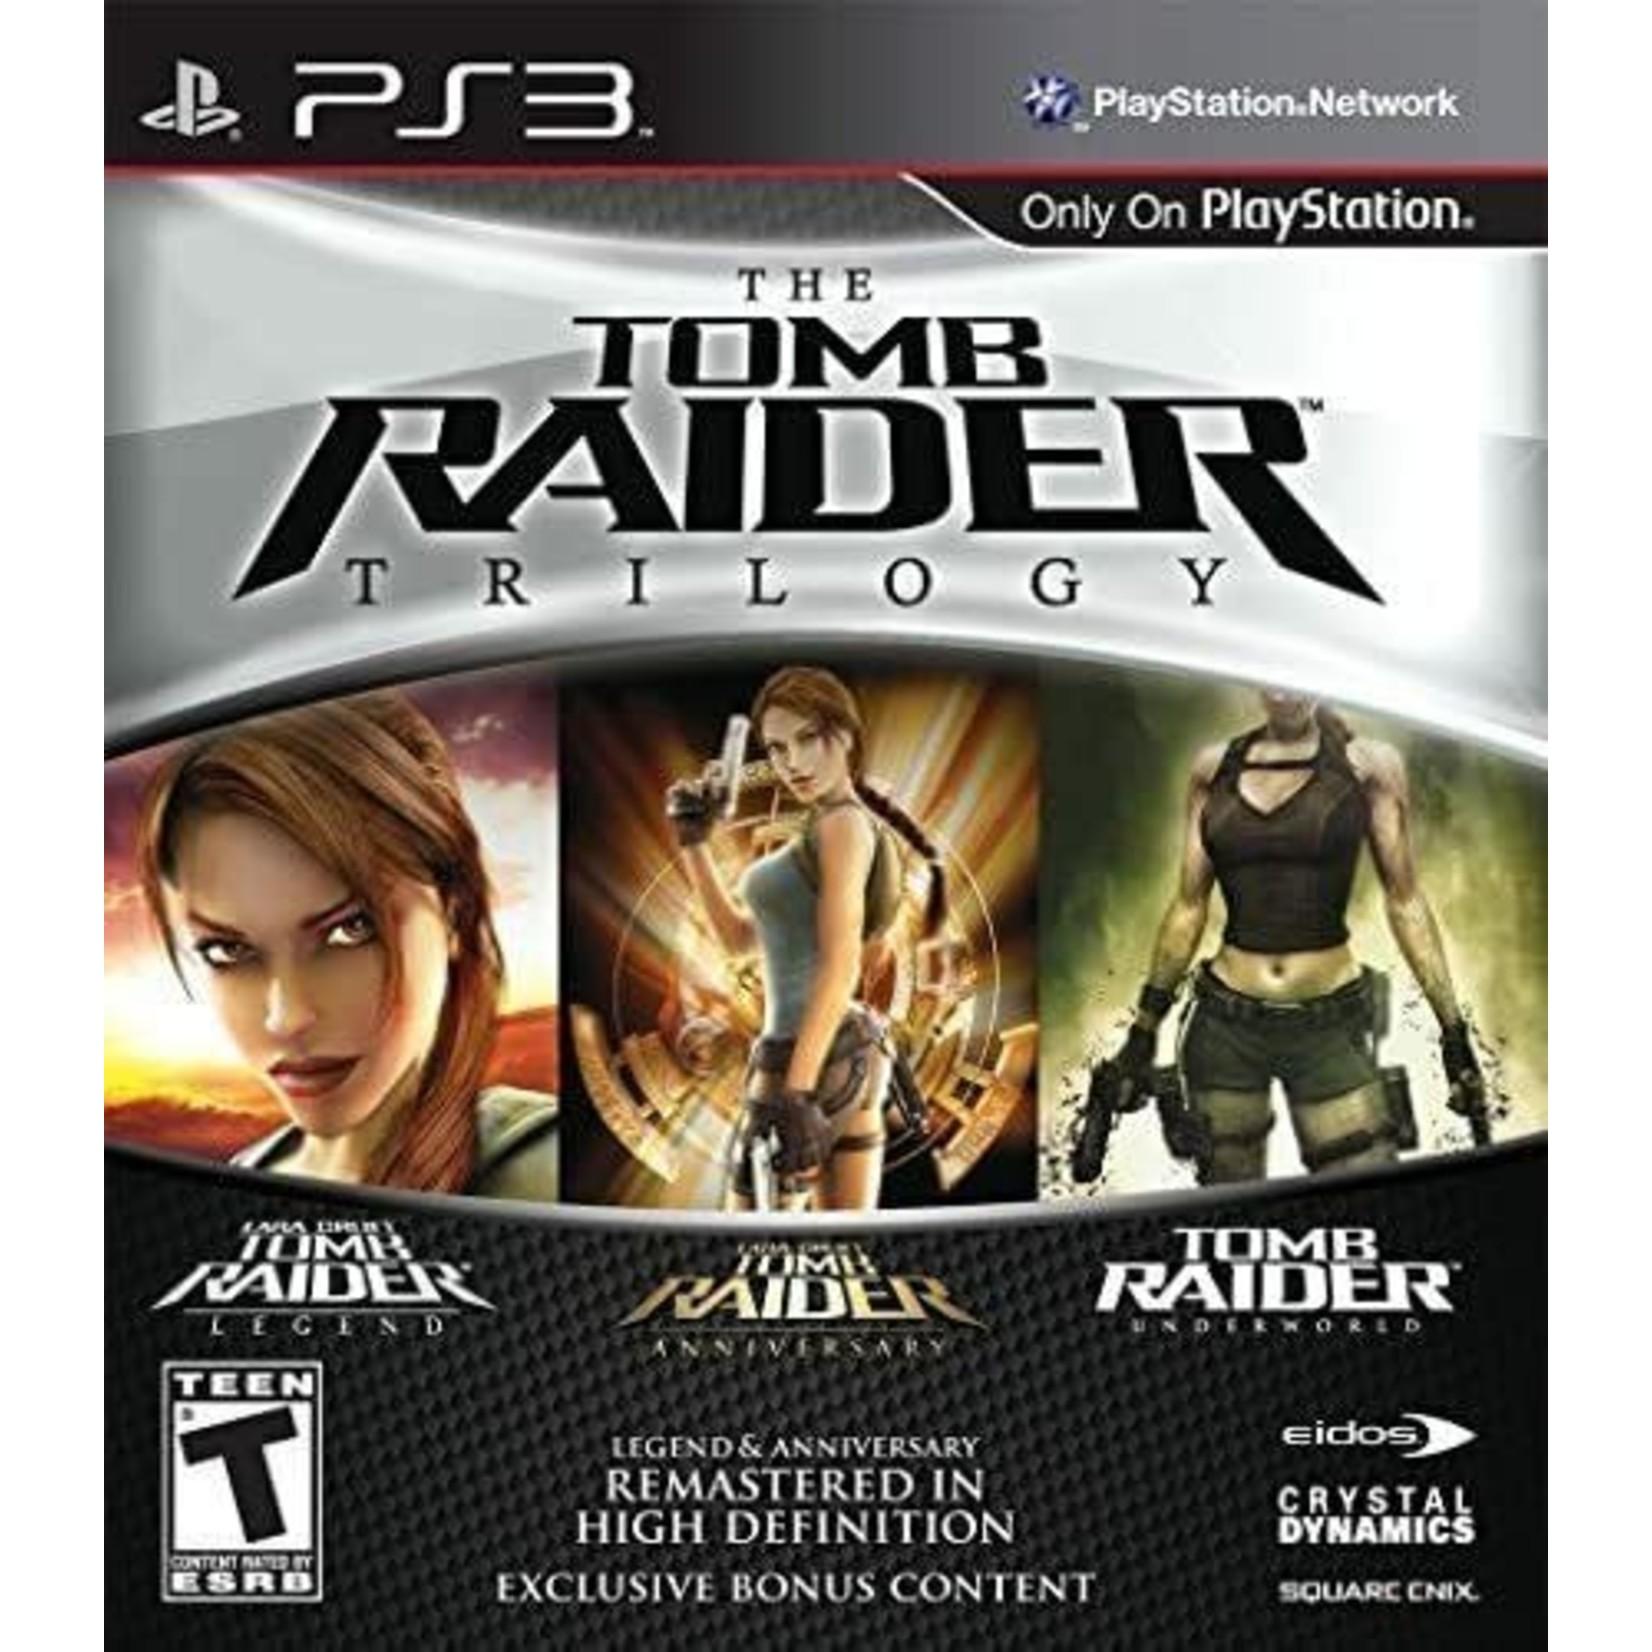 PS3-TOMB RAIDER TRILOGY